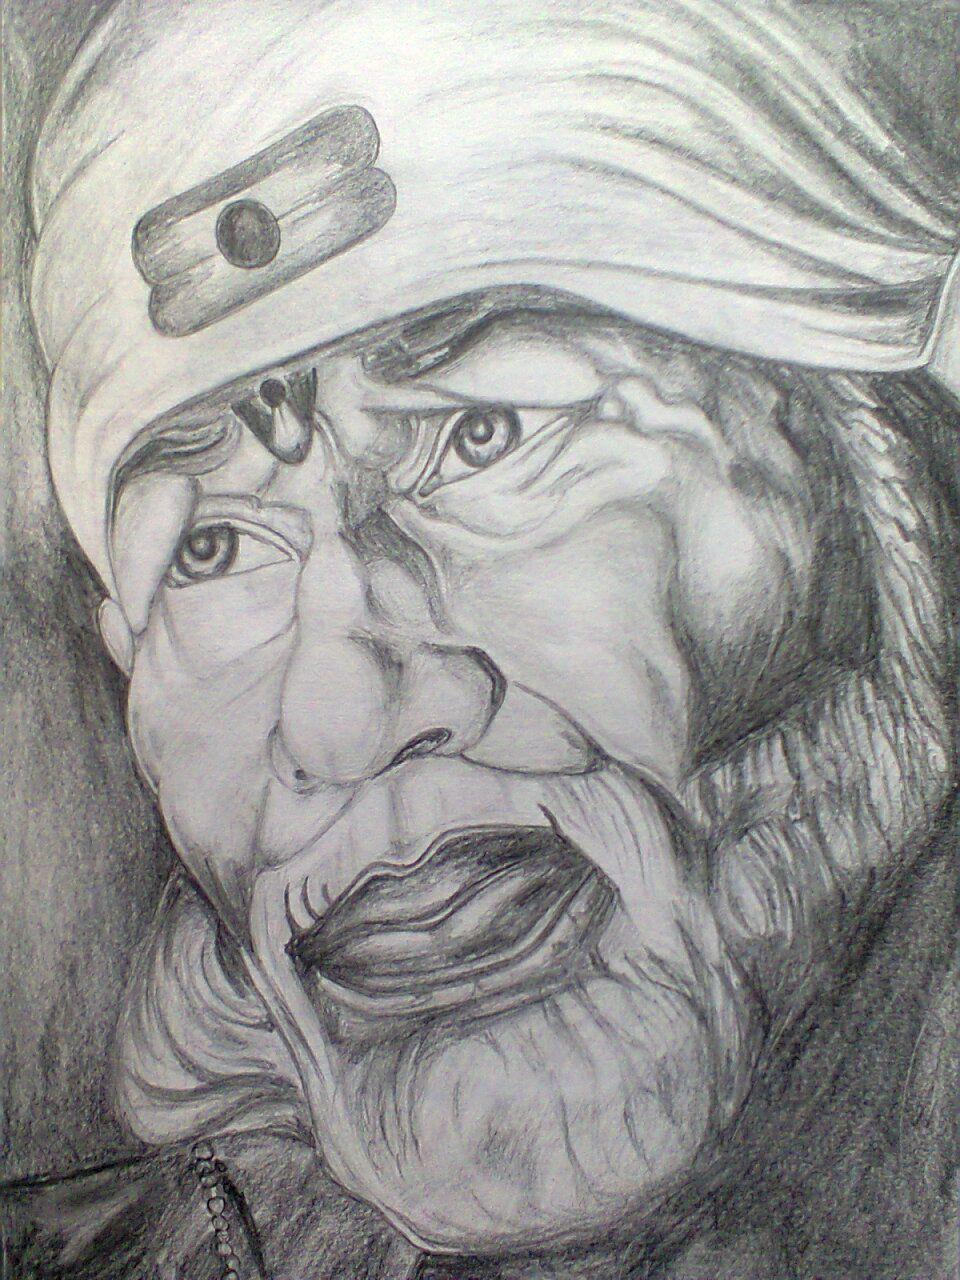 Sai Baba Pencil Sketch